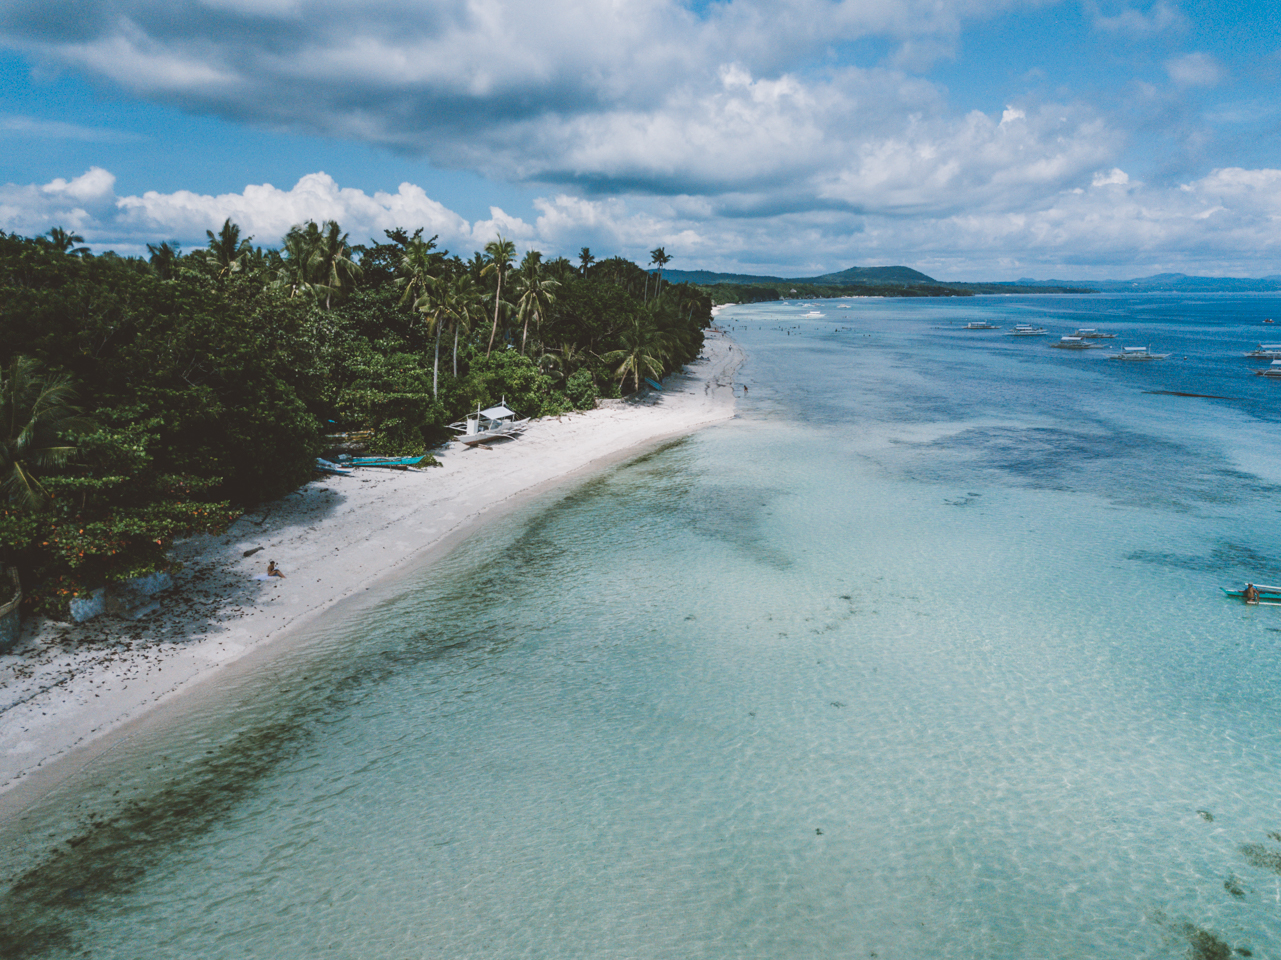 Philippines-1-39.jpg